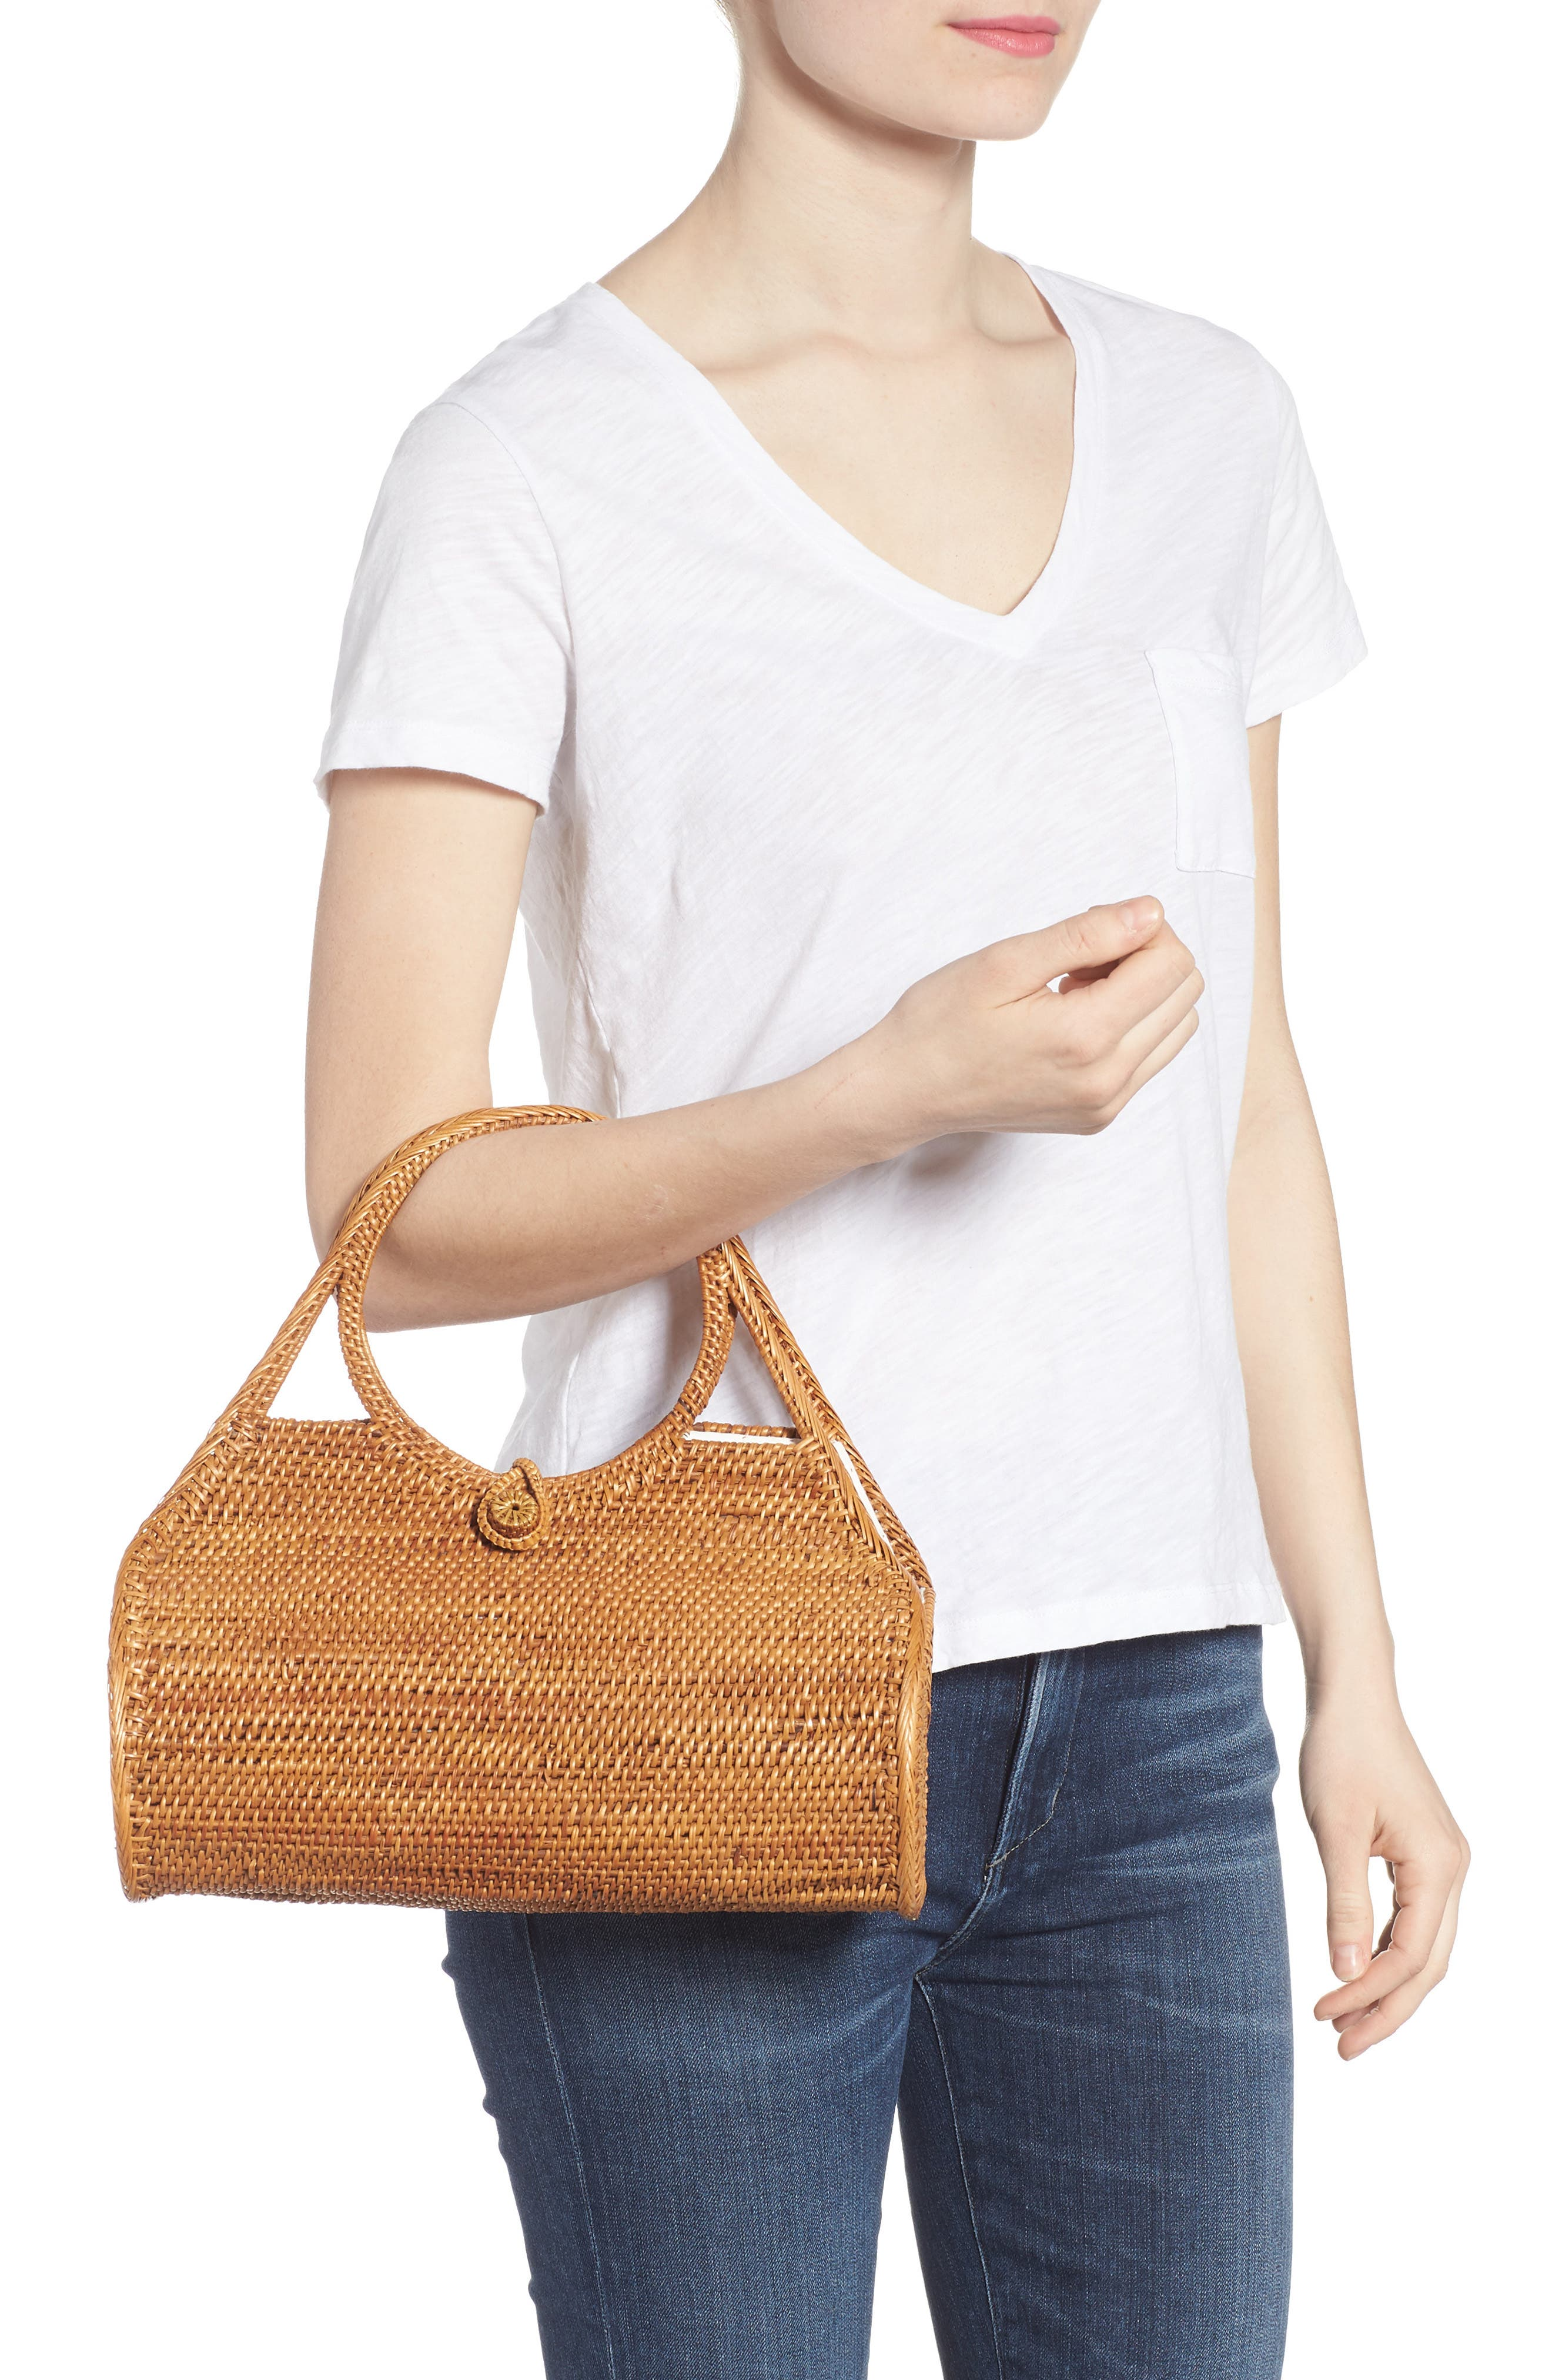 Woven Rattan Handbag,                             Alternate thumbnail 2, color,                             230